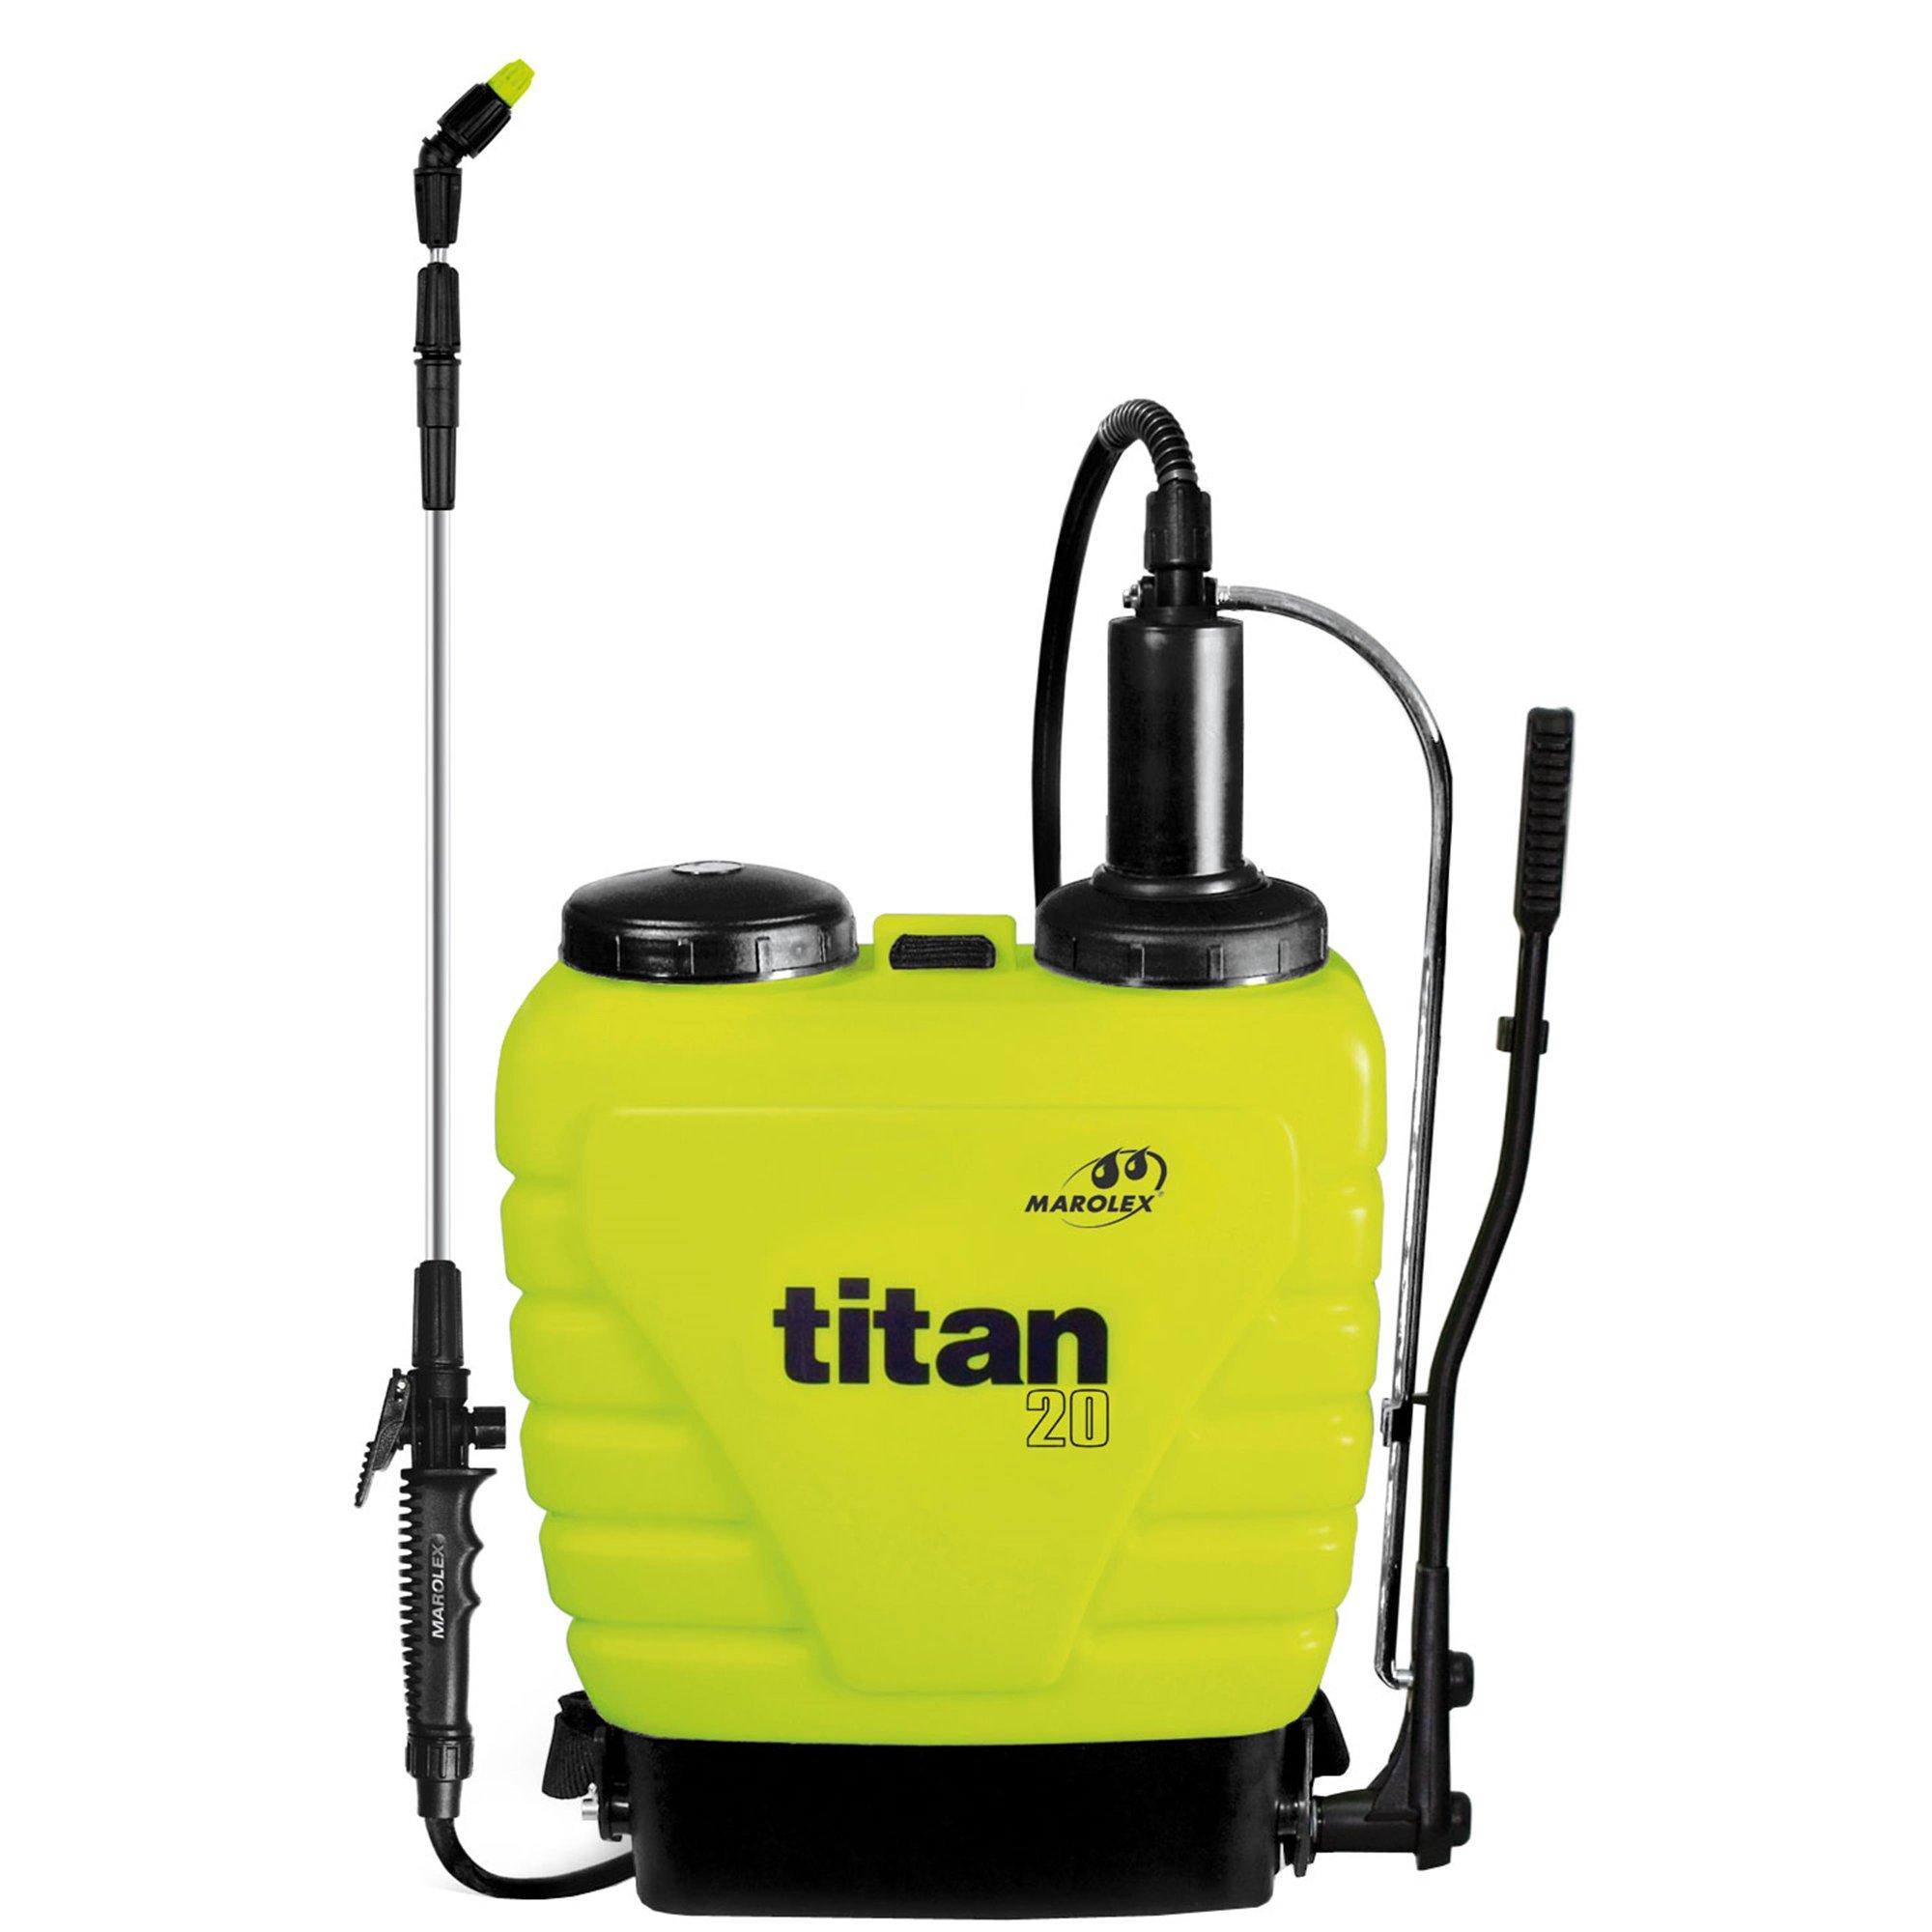 Marolex Sprayer Titan, Dichtung Viton Sprayer Titan 20 L. Viton